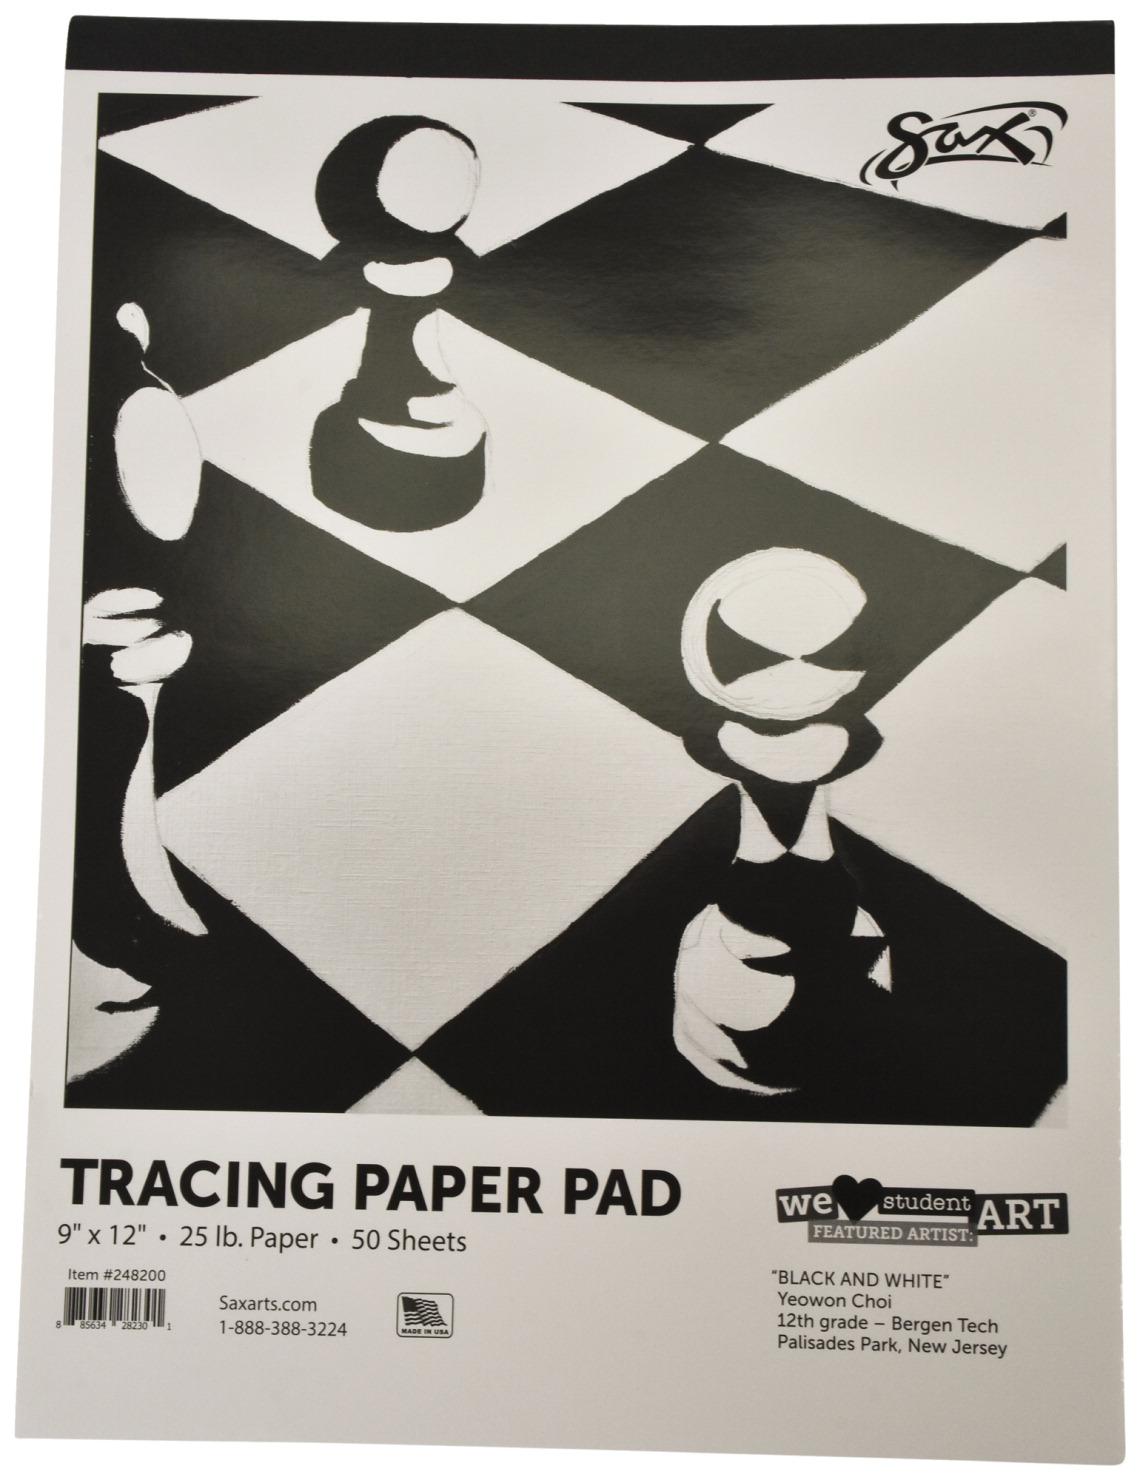 Sax Tracing Paper Pad 25 Lb 9 X 12 Inches White 50